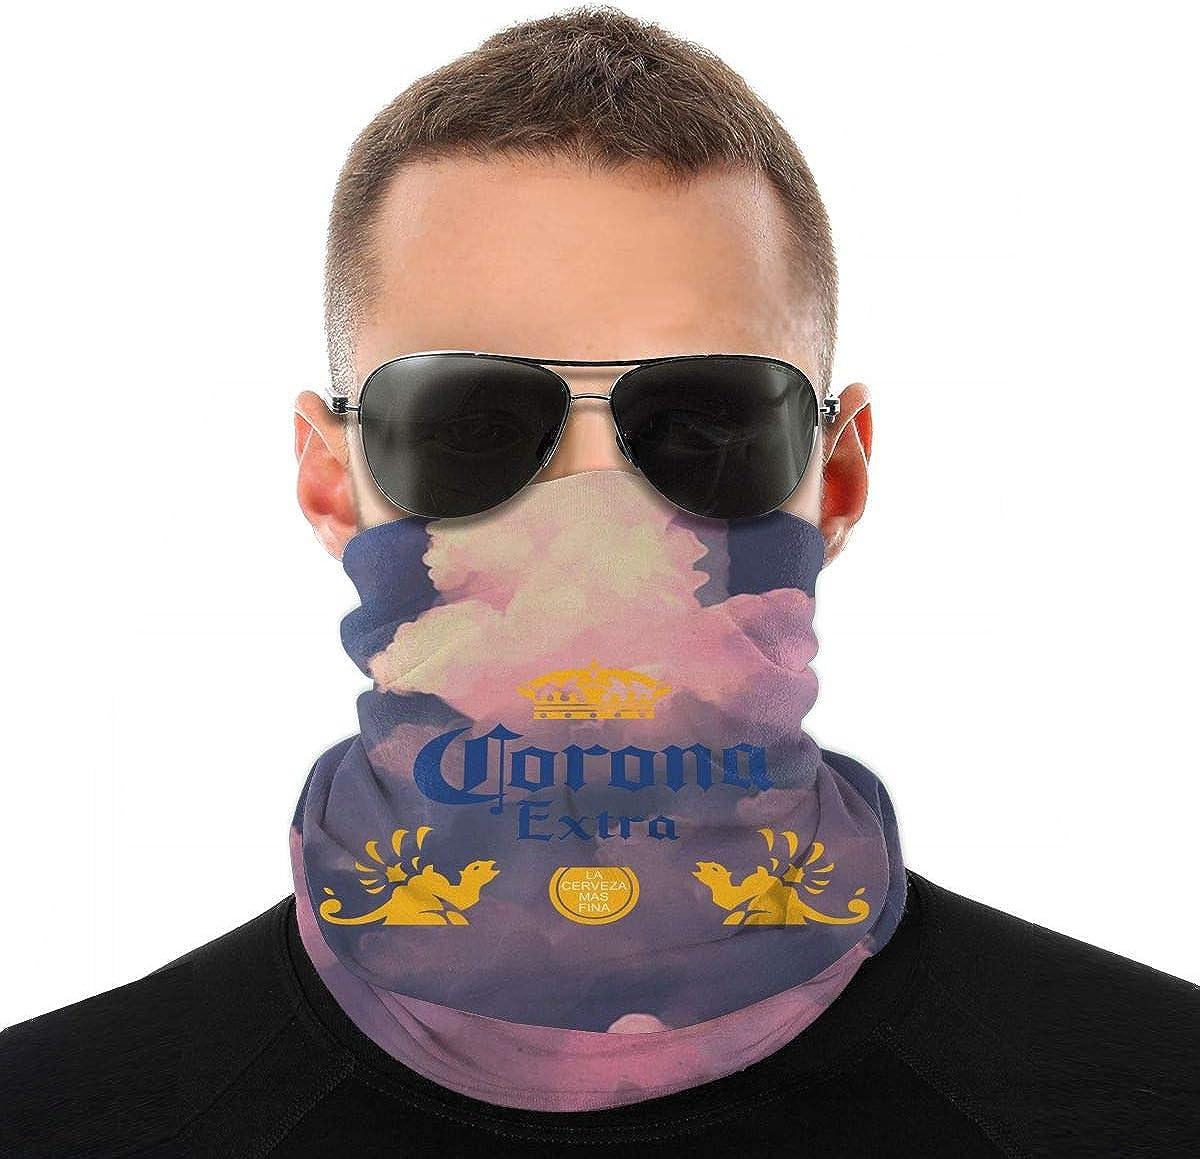 Corona, accesorio extra de cerveza, protector para la cara, pasamontañas